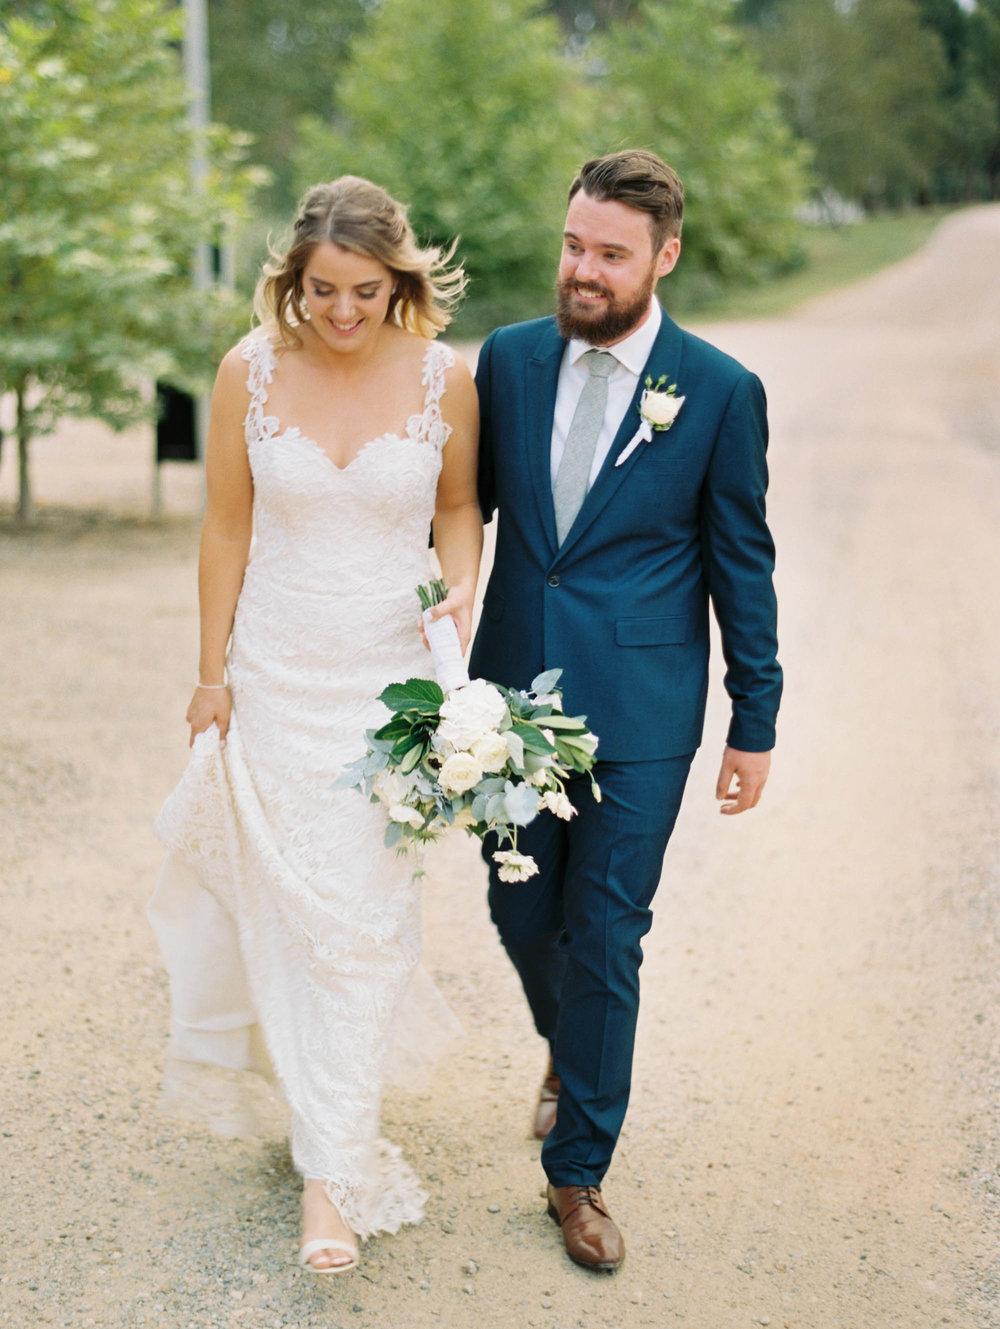 Golding-Wines-wedding-photography-086.jpg